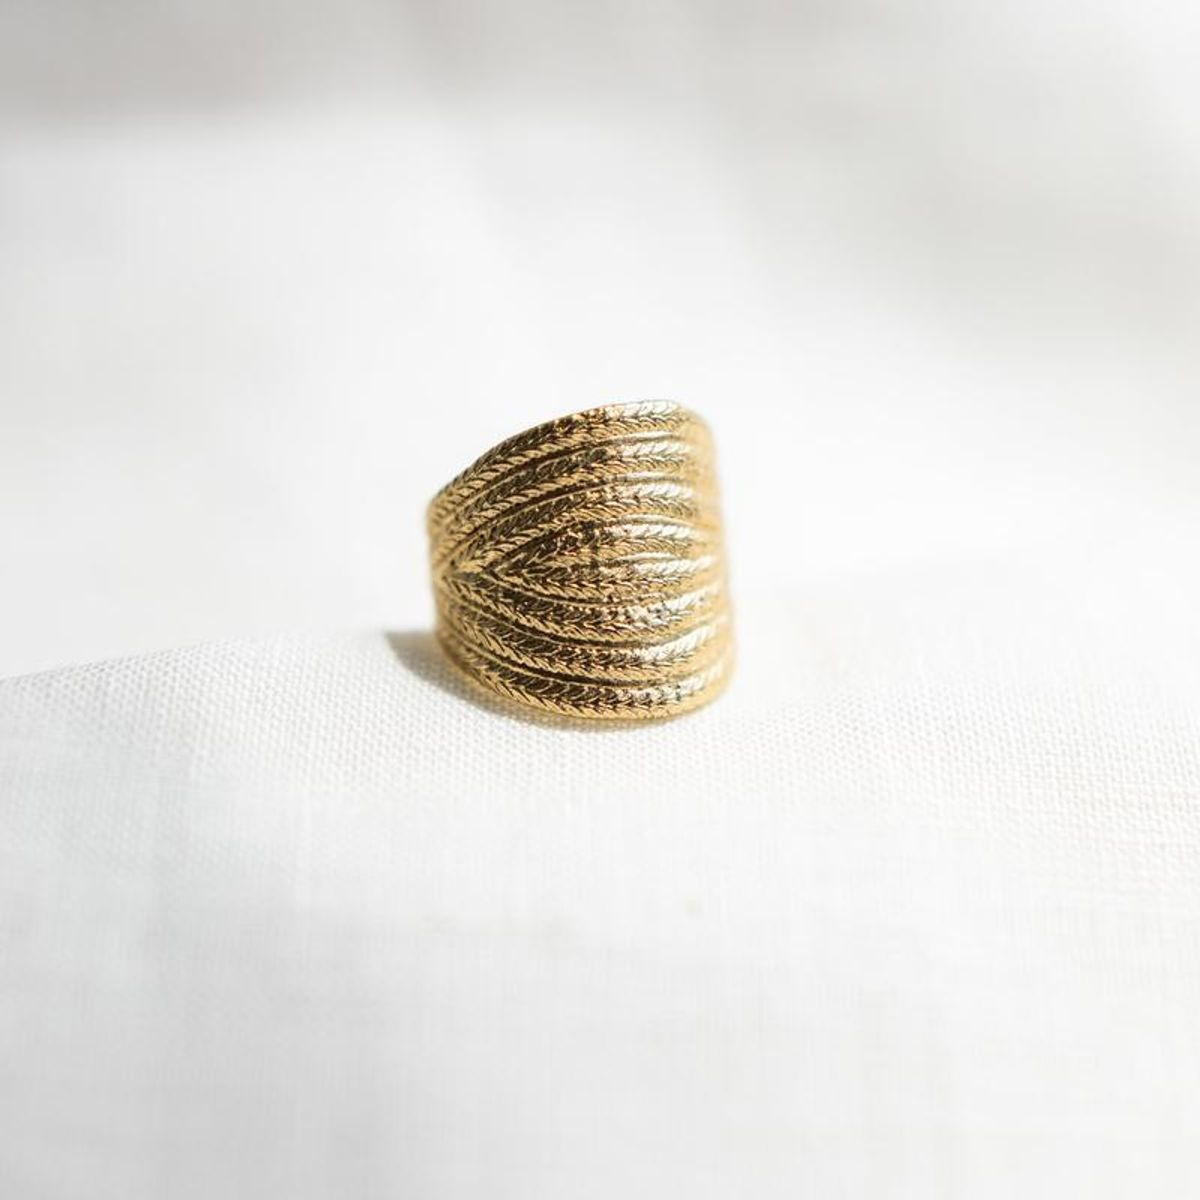 agape athenais ring